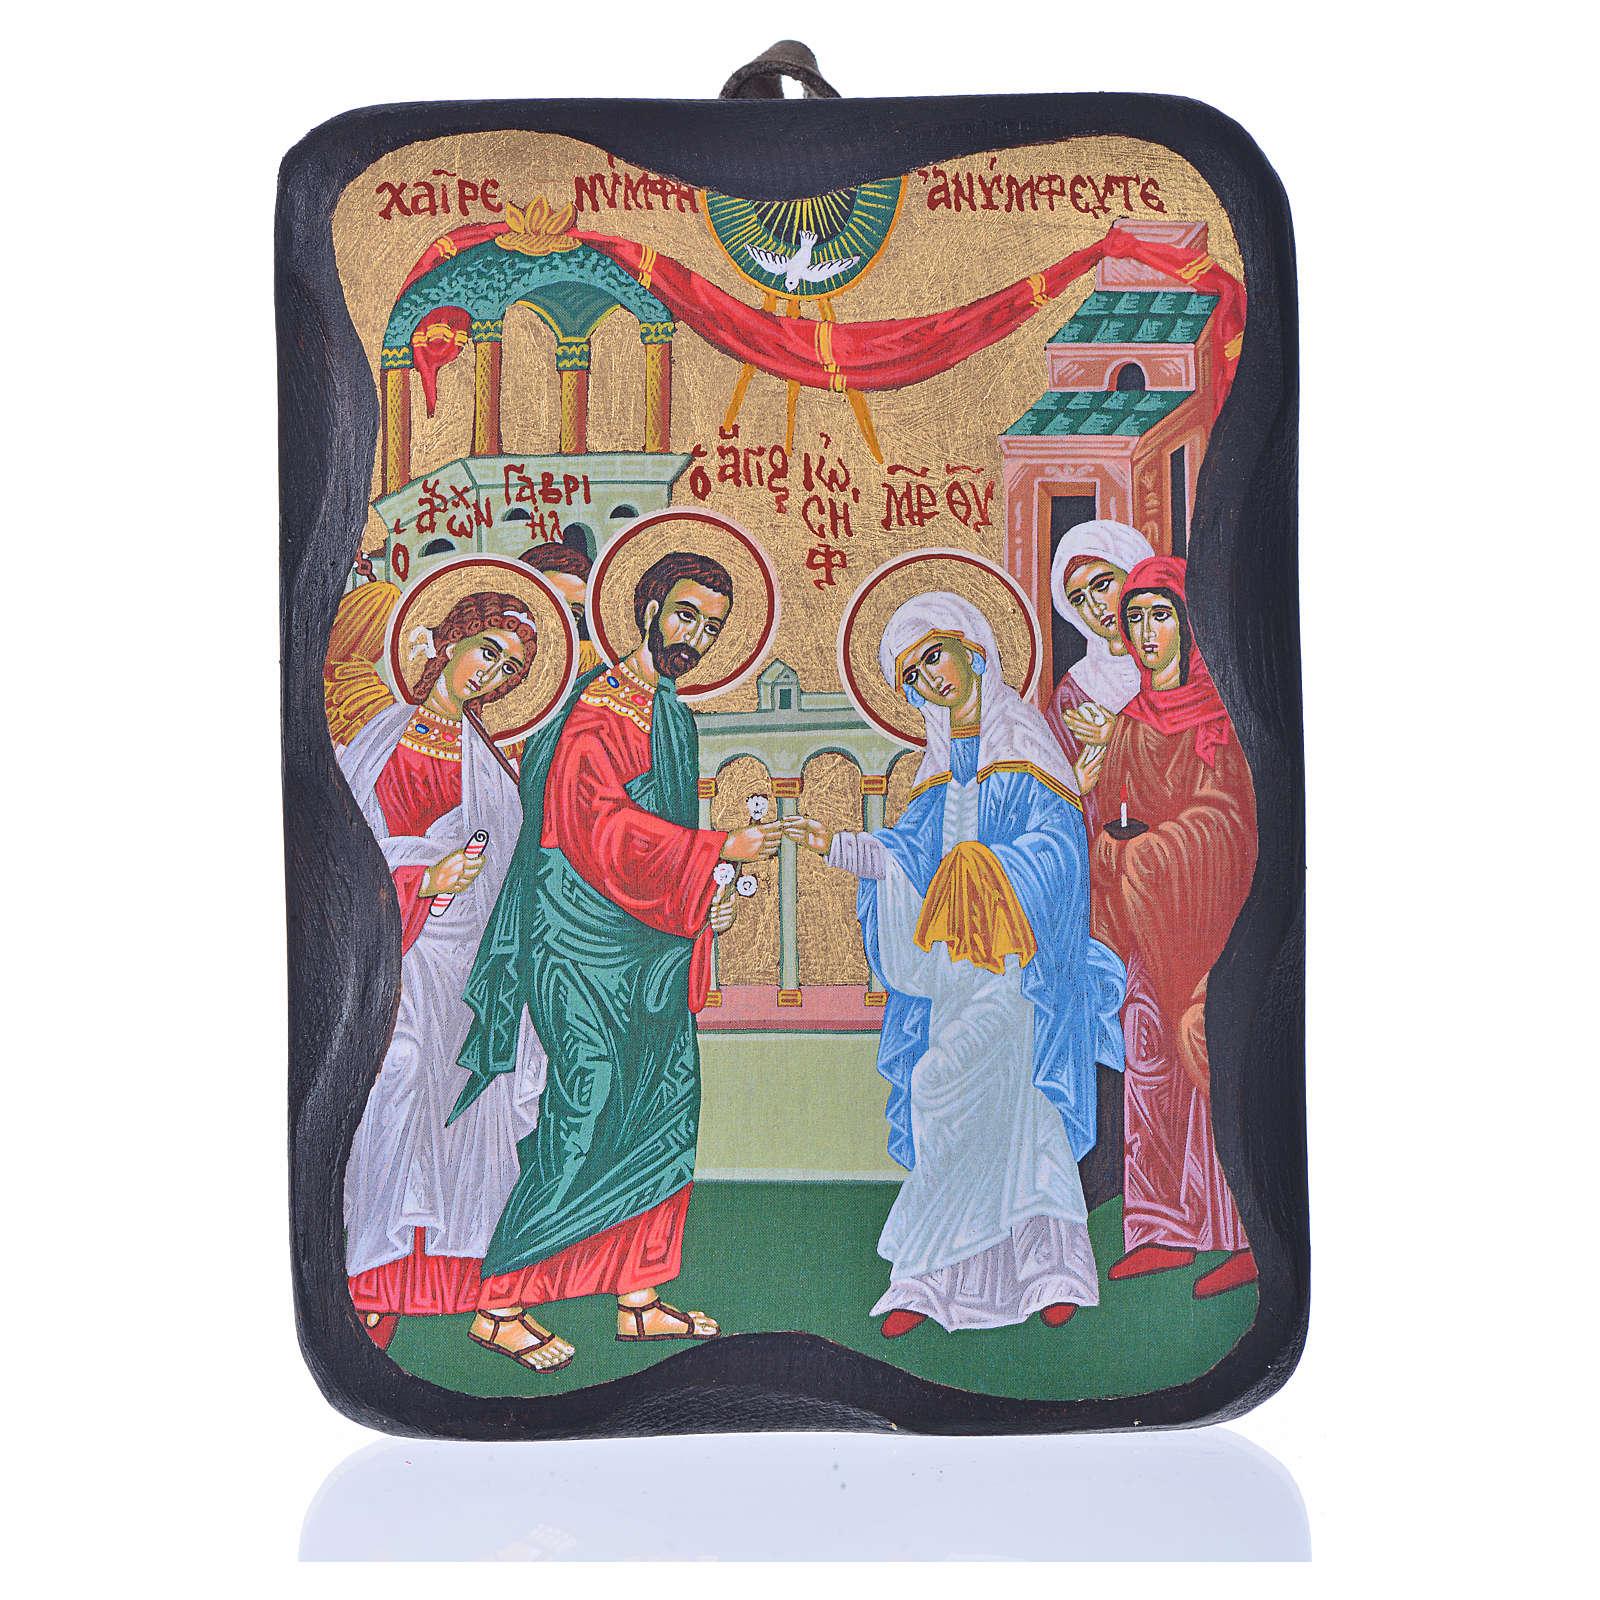 Joseph and Mary's wedding icon, 13x11cm, screenprinted in Greece 4